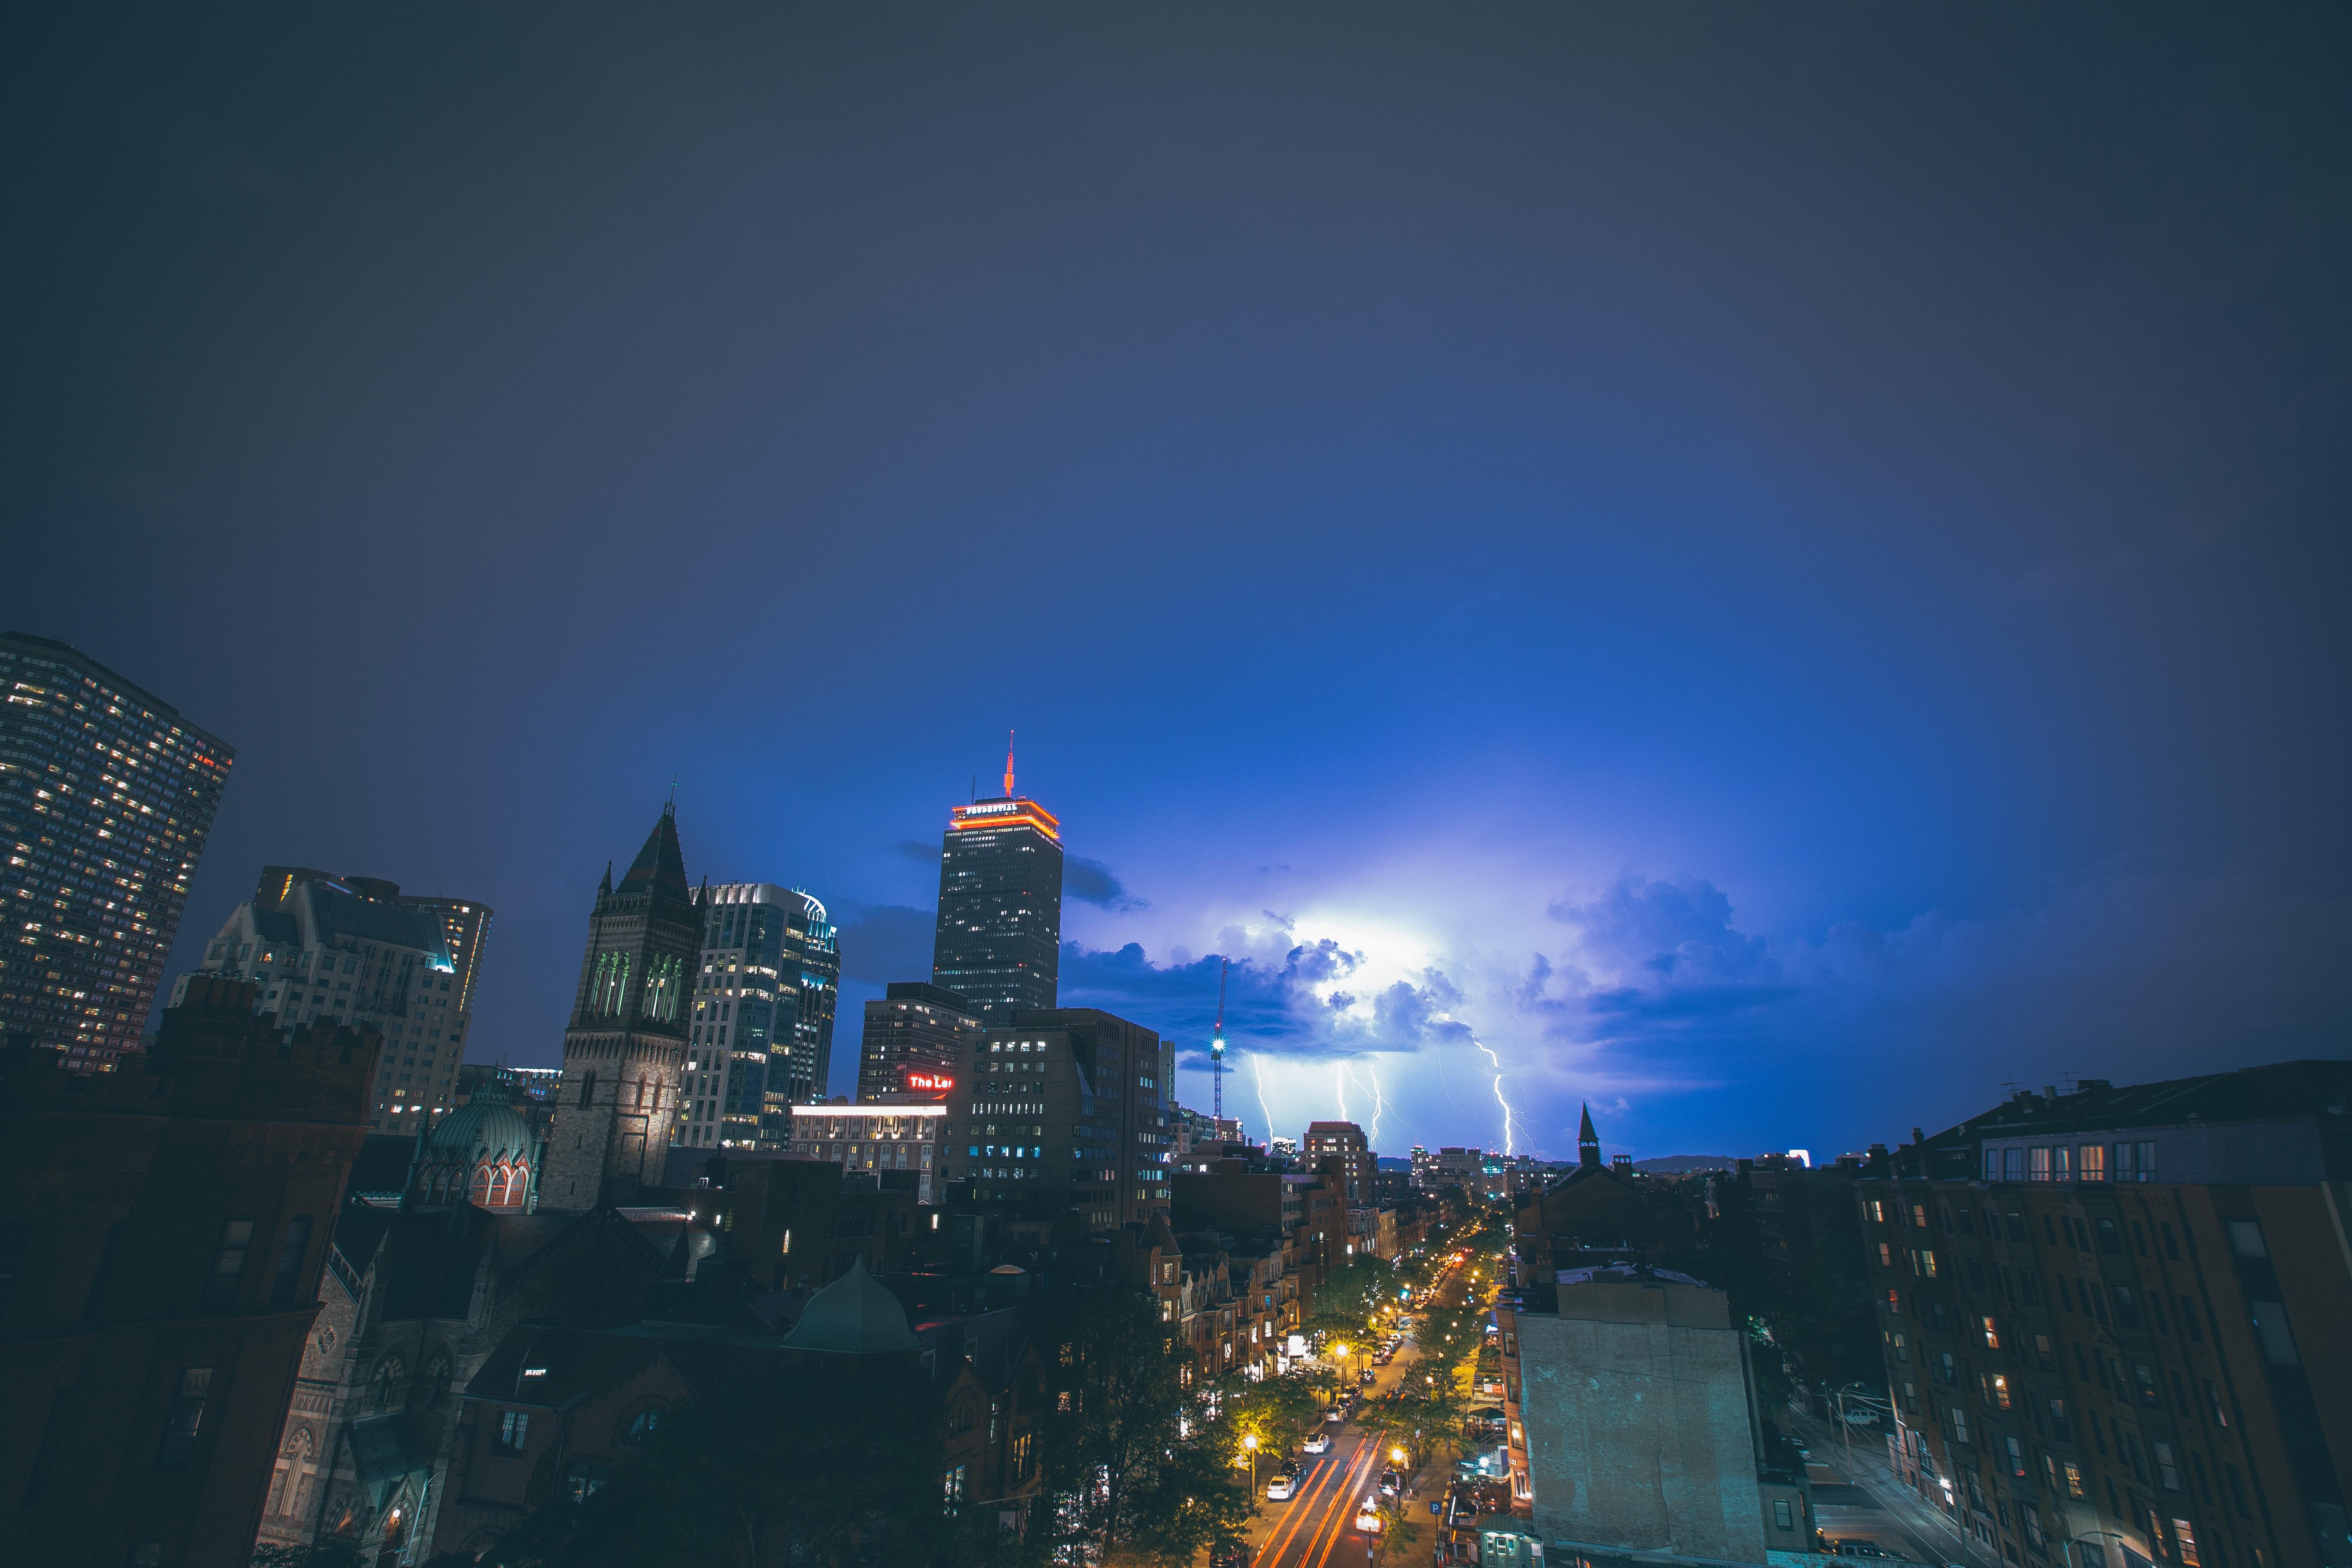 E thunder